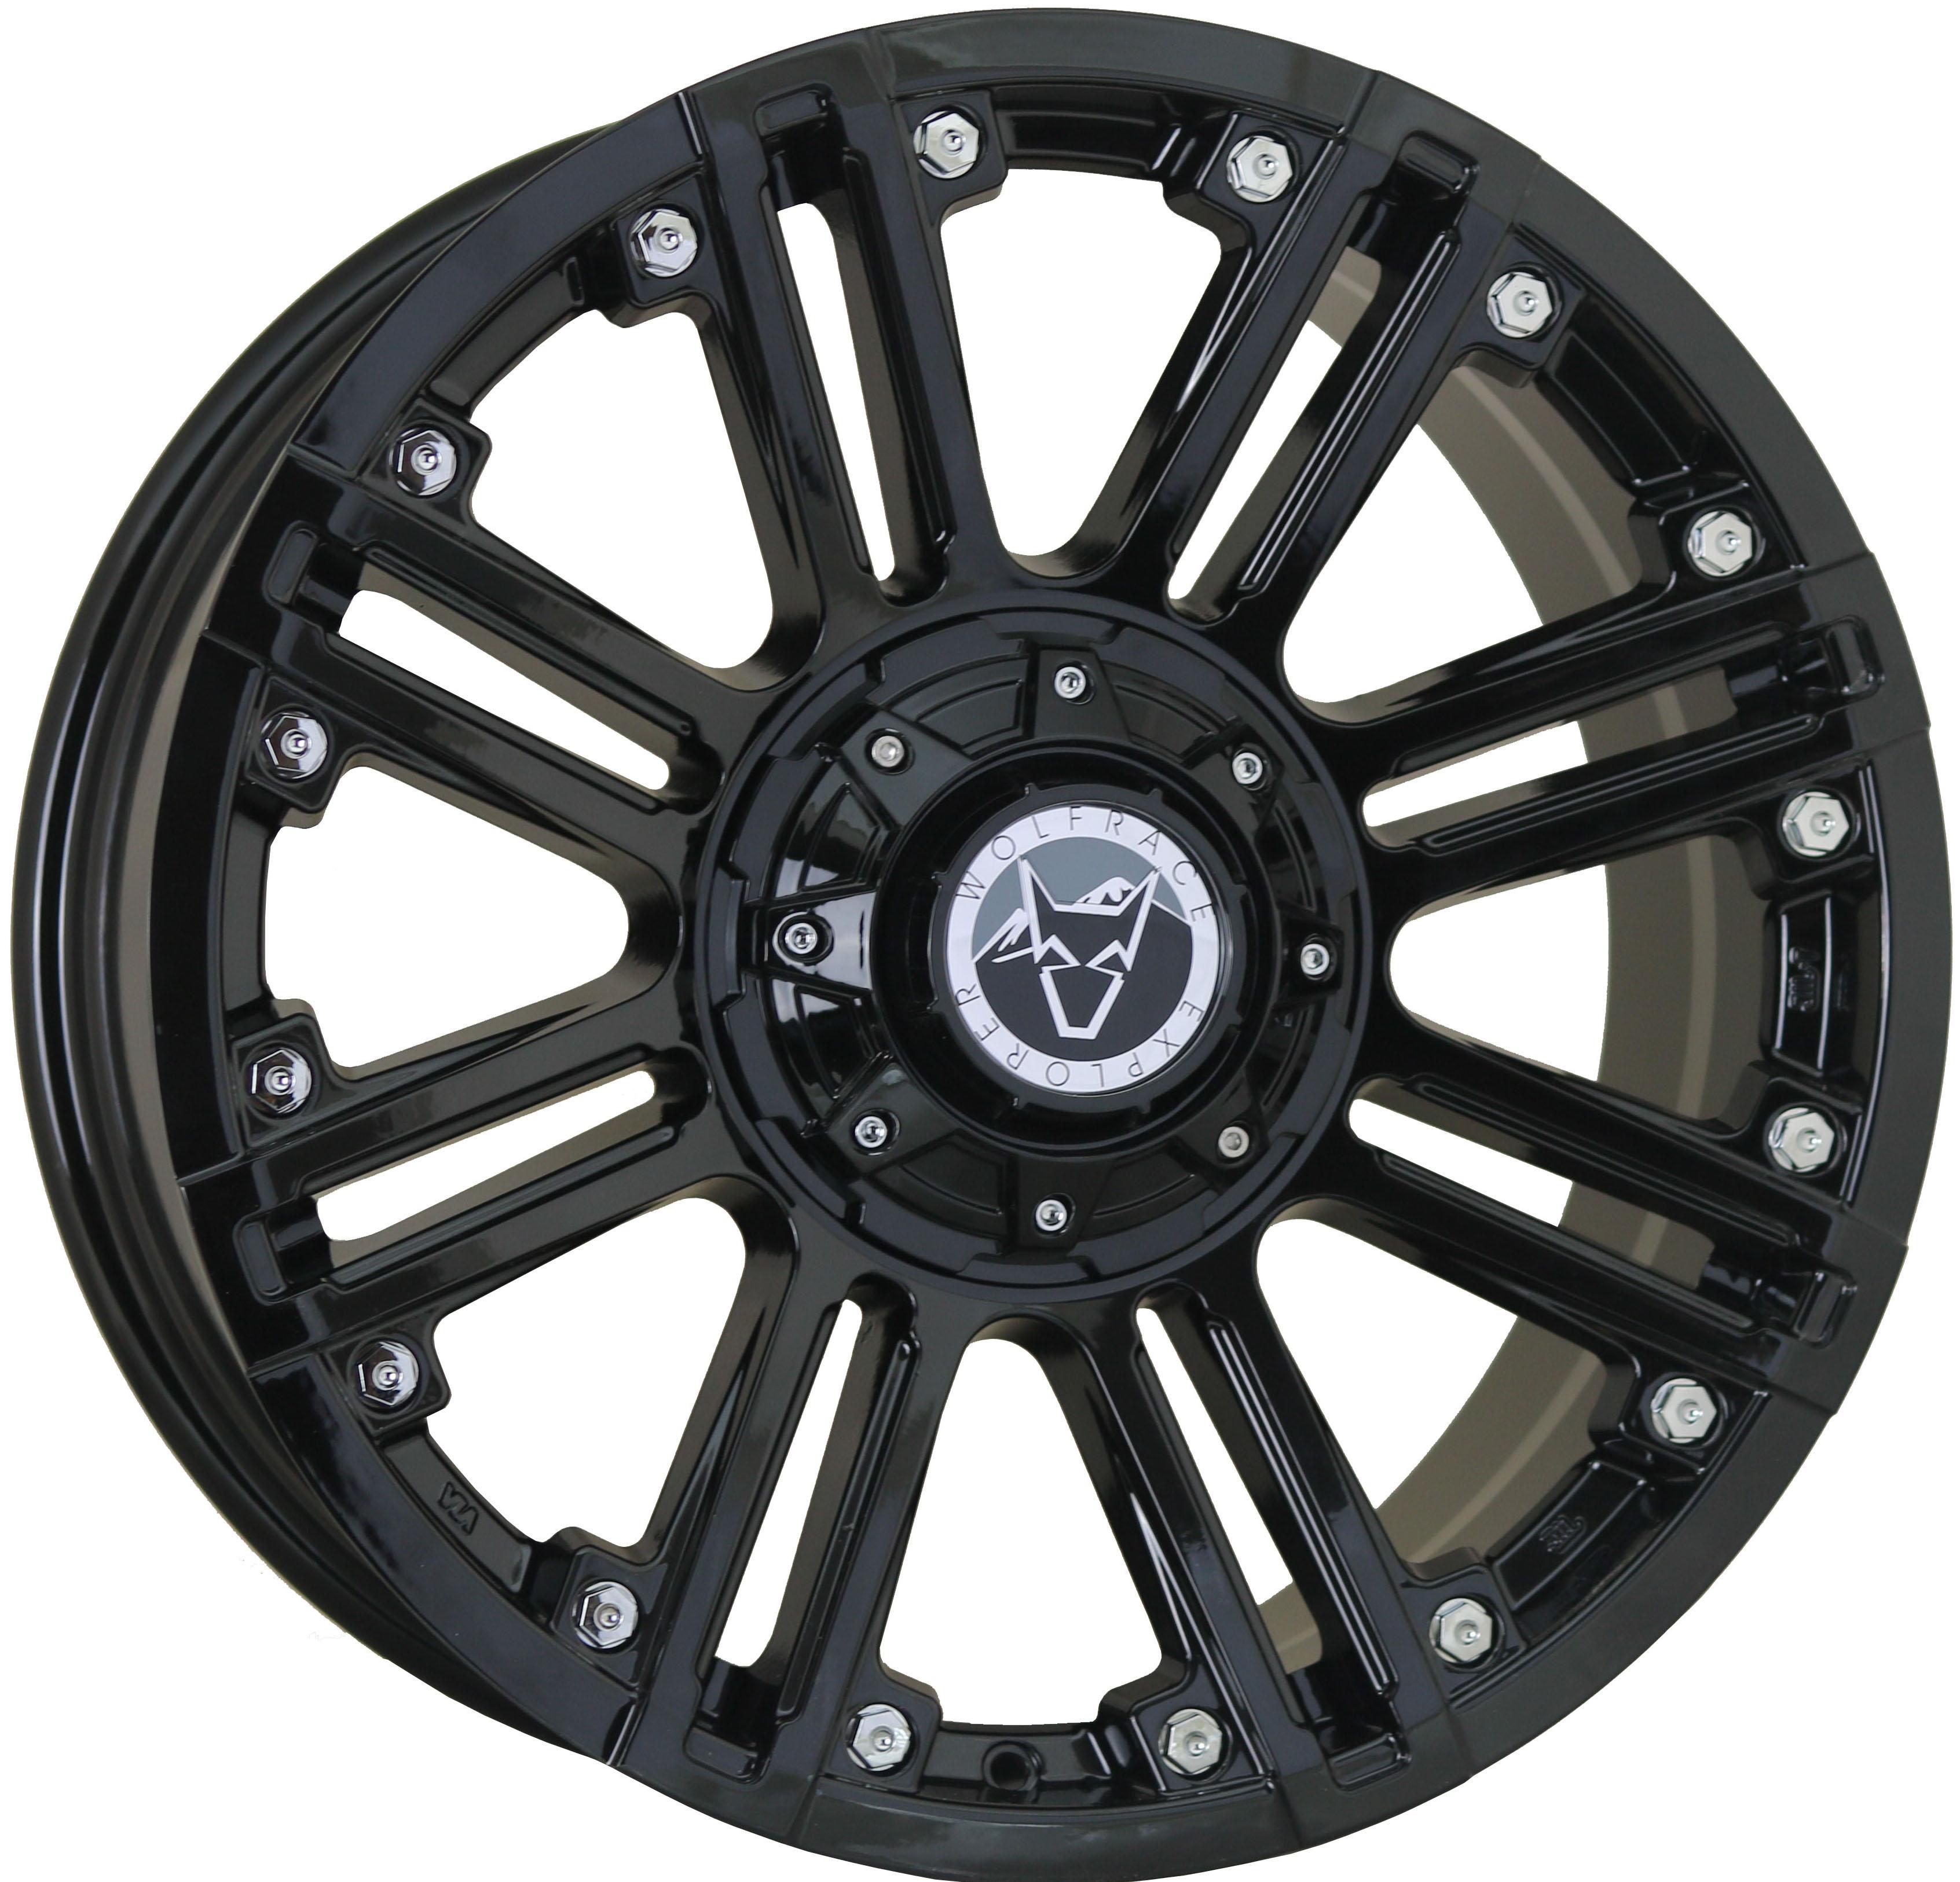 Wolfrace Explorer - Amazon (Gloss Black / Chrome rivets)